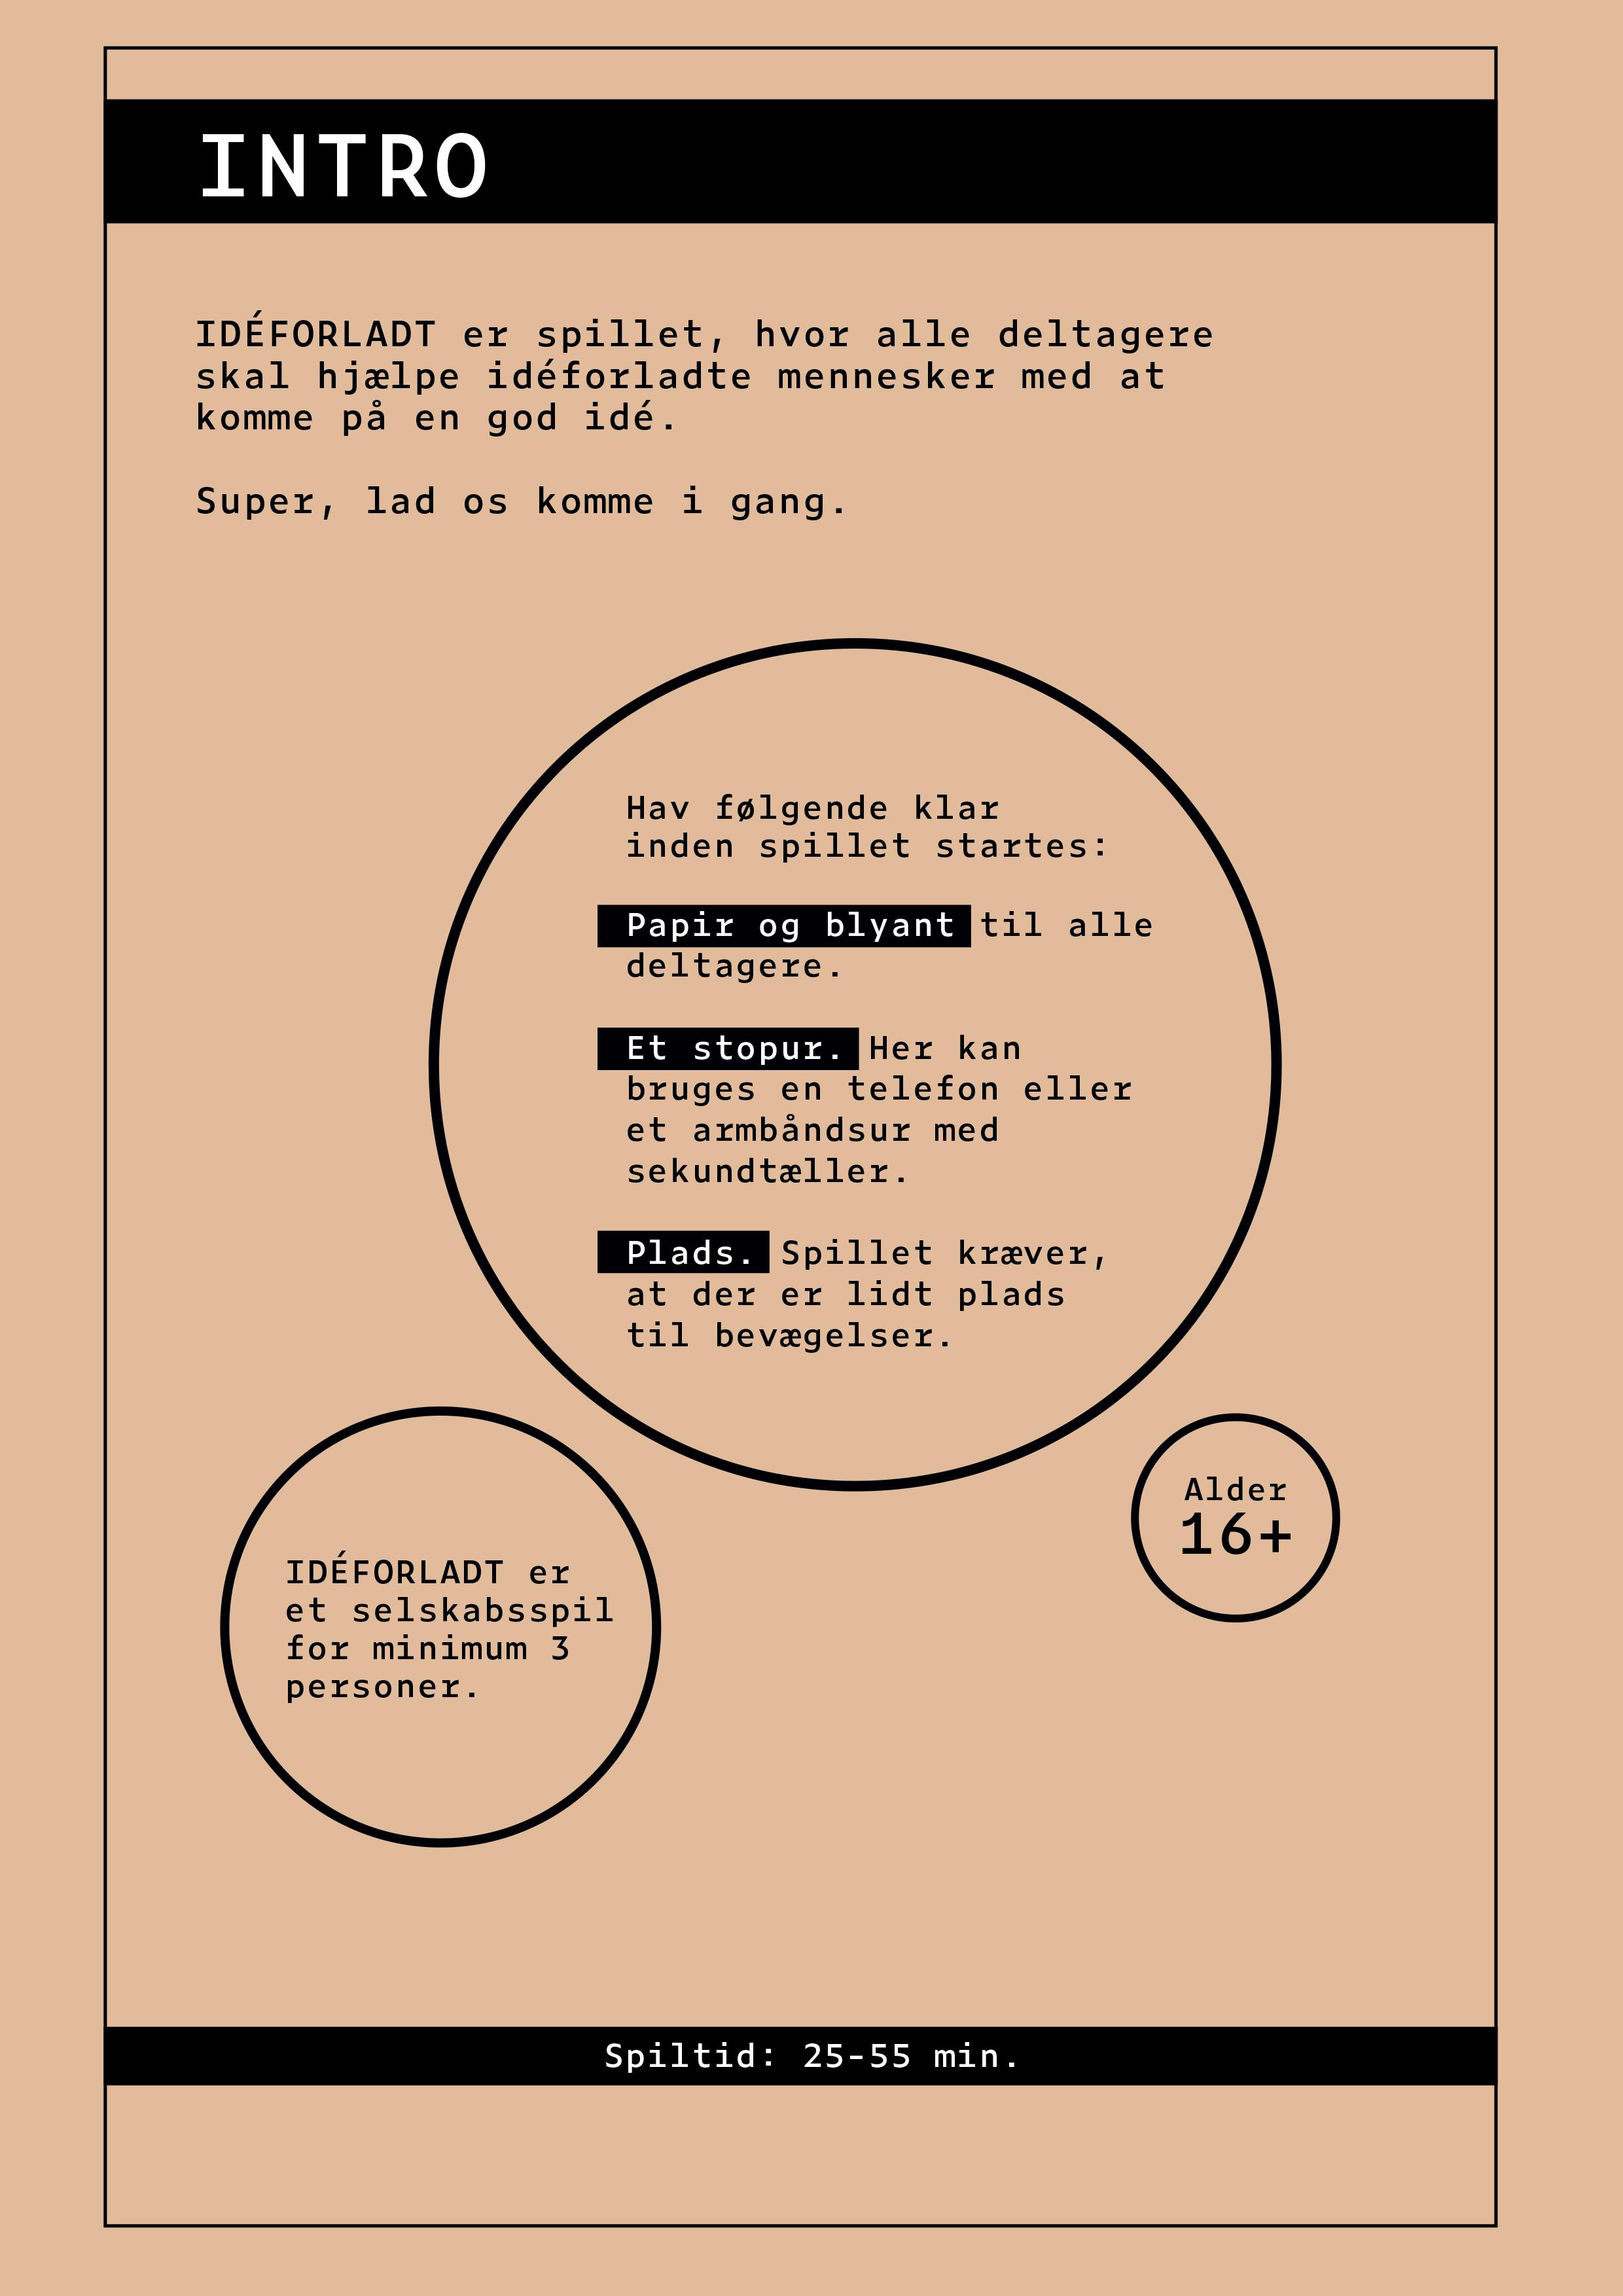 Intro-web-1